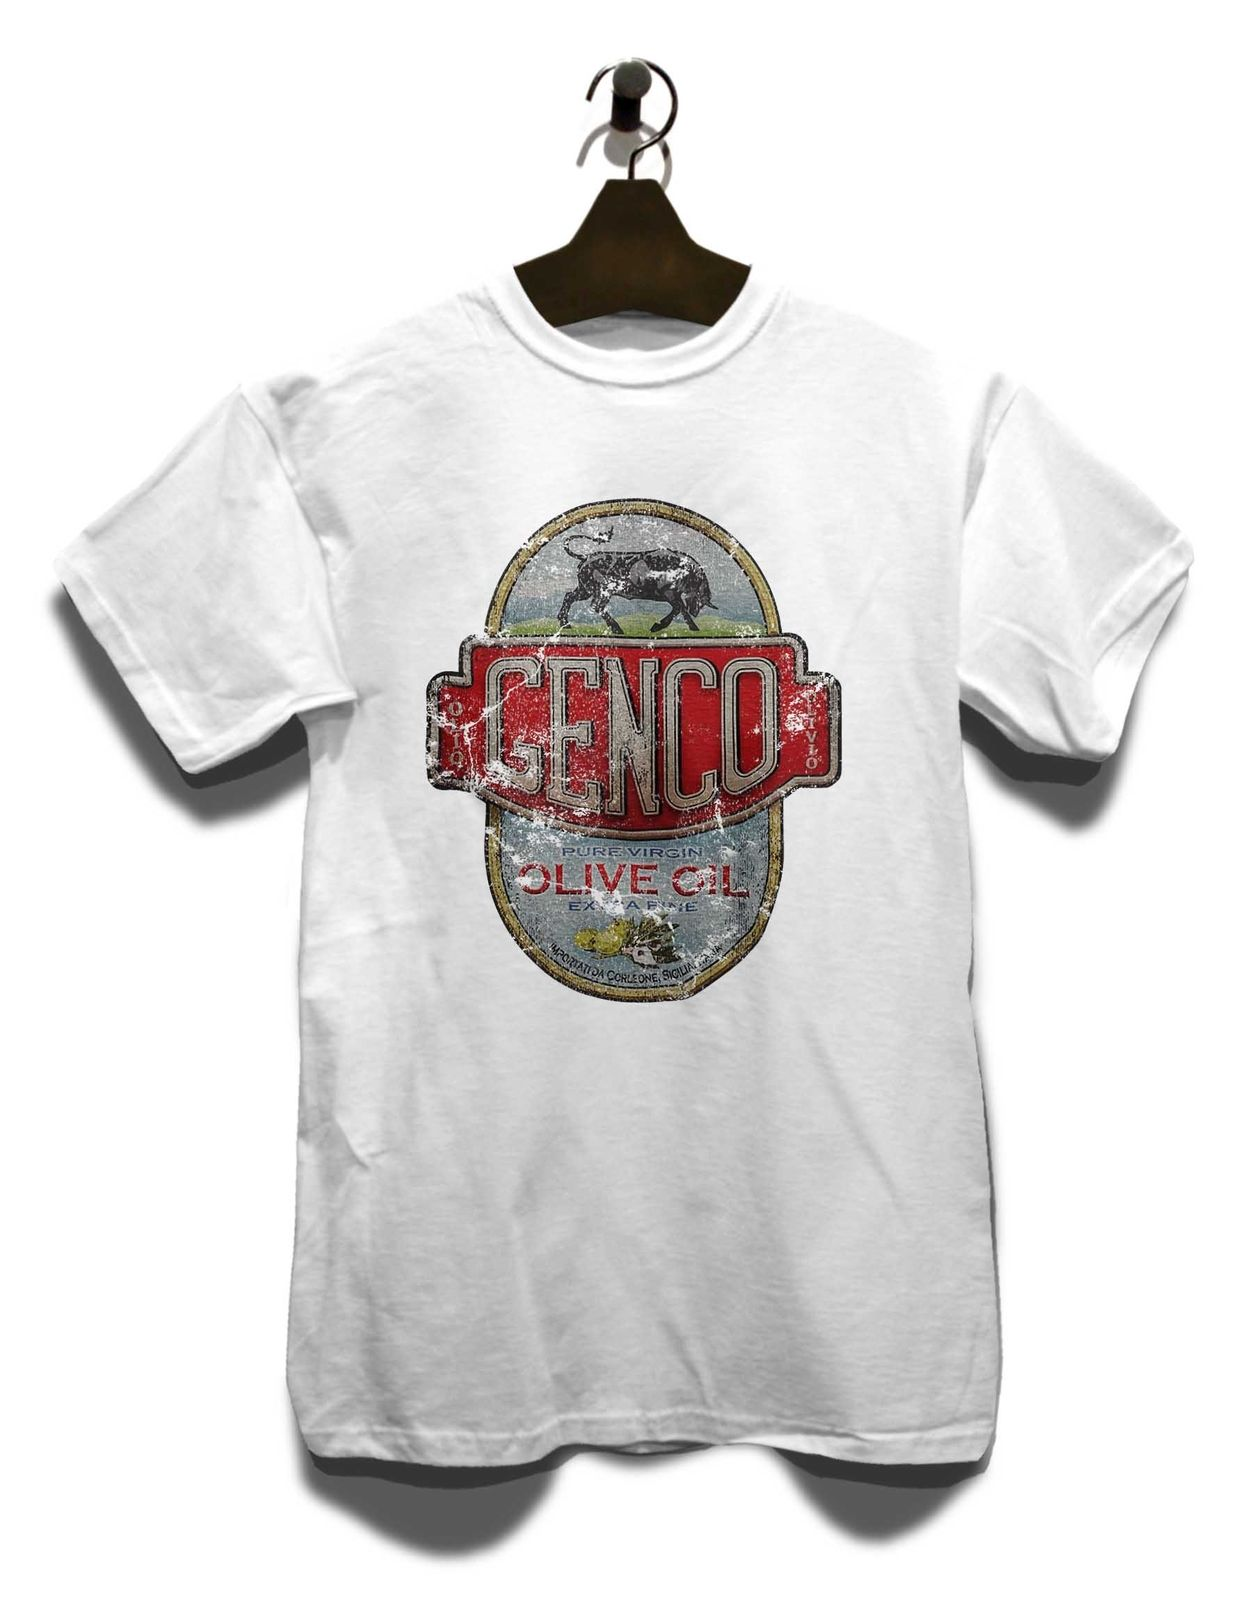 Genco Oil Company T-Shirt Mafia Pate Gangster Oldschool Vintage Retro